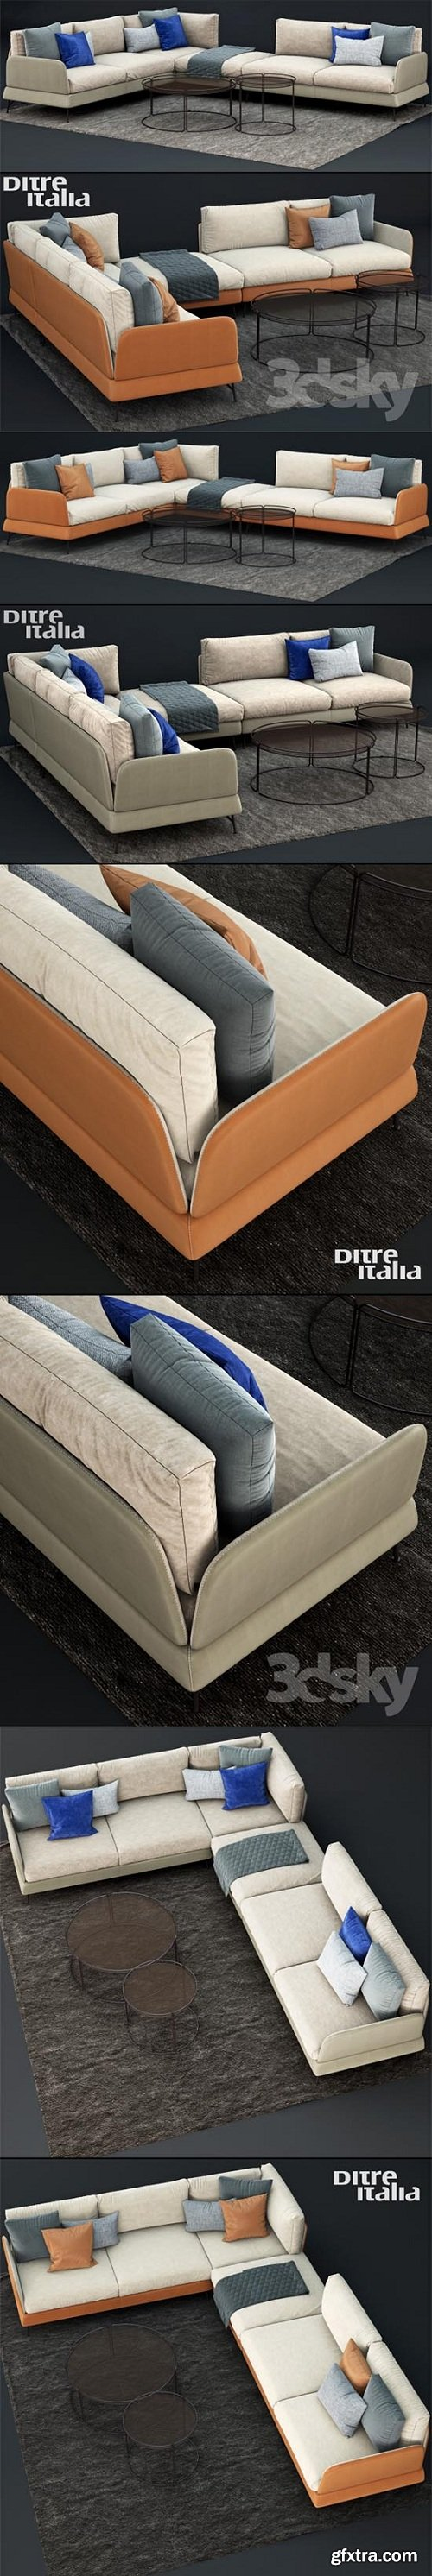 Ditre Italia JASPER Canape 3d model